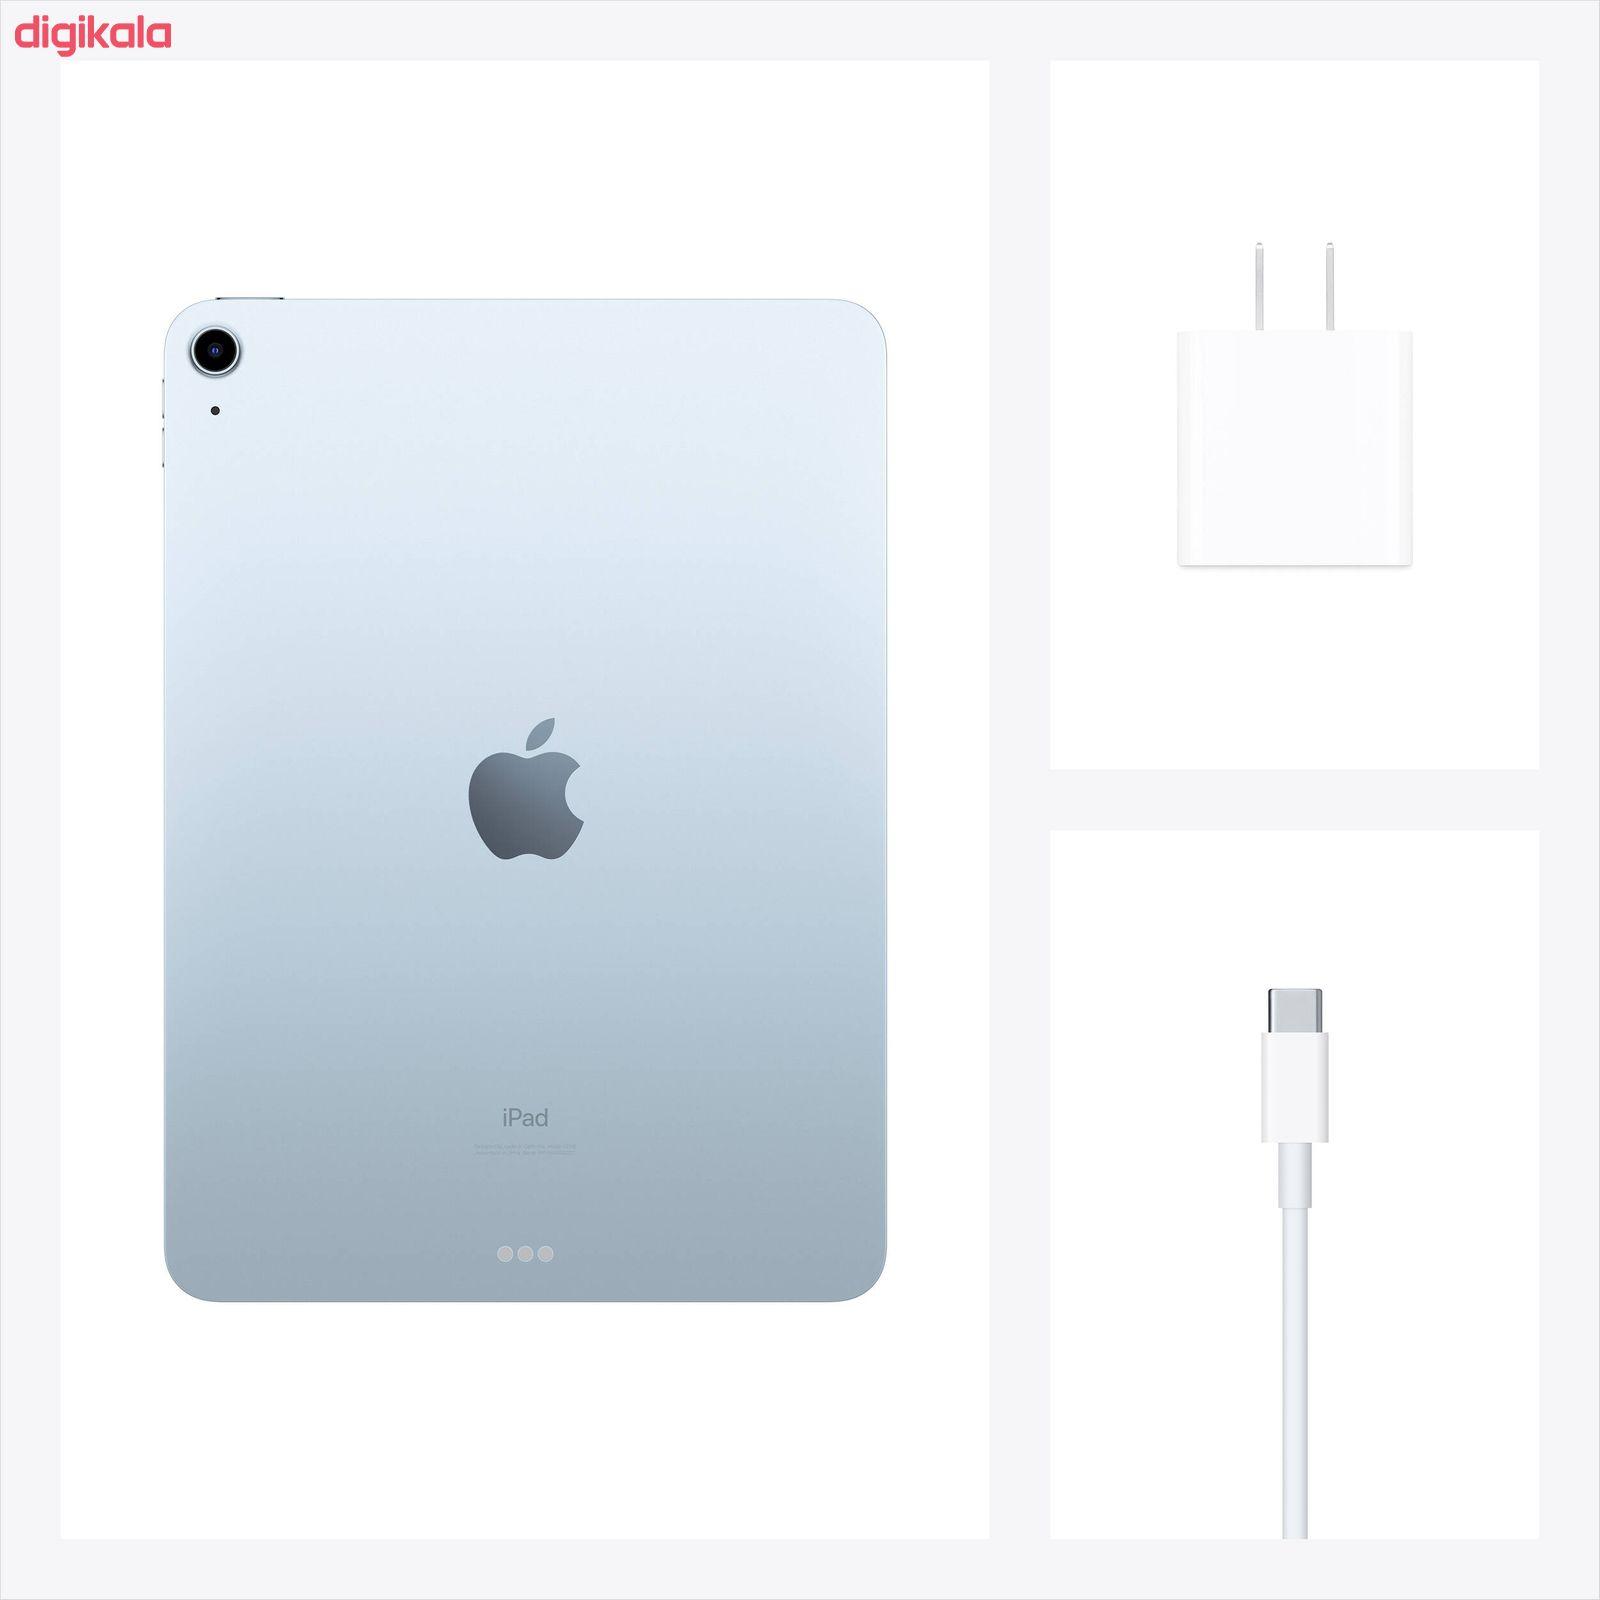 تبلت اپل مدل iPad Air 10.9 inch 2020 WiFi ظرفیت 64 گیگابایت  main 1 3